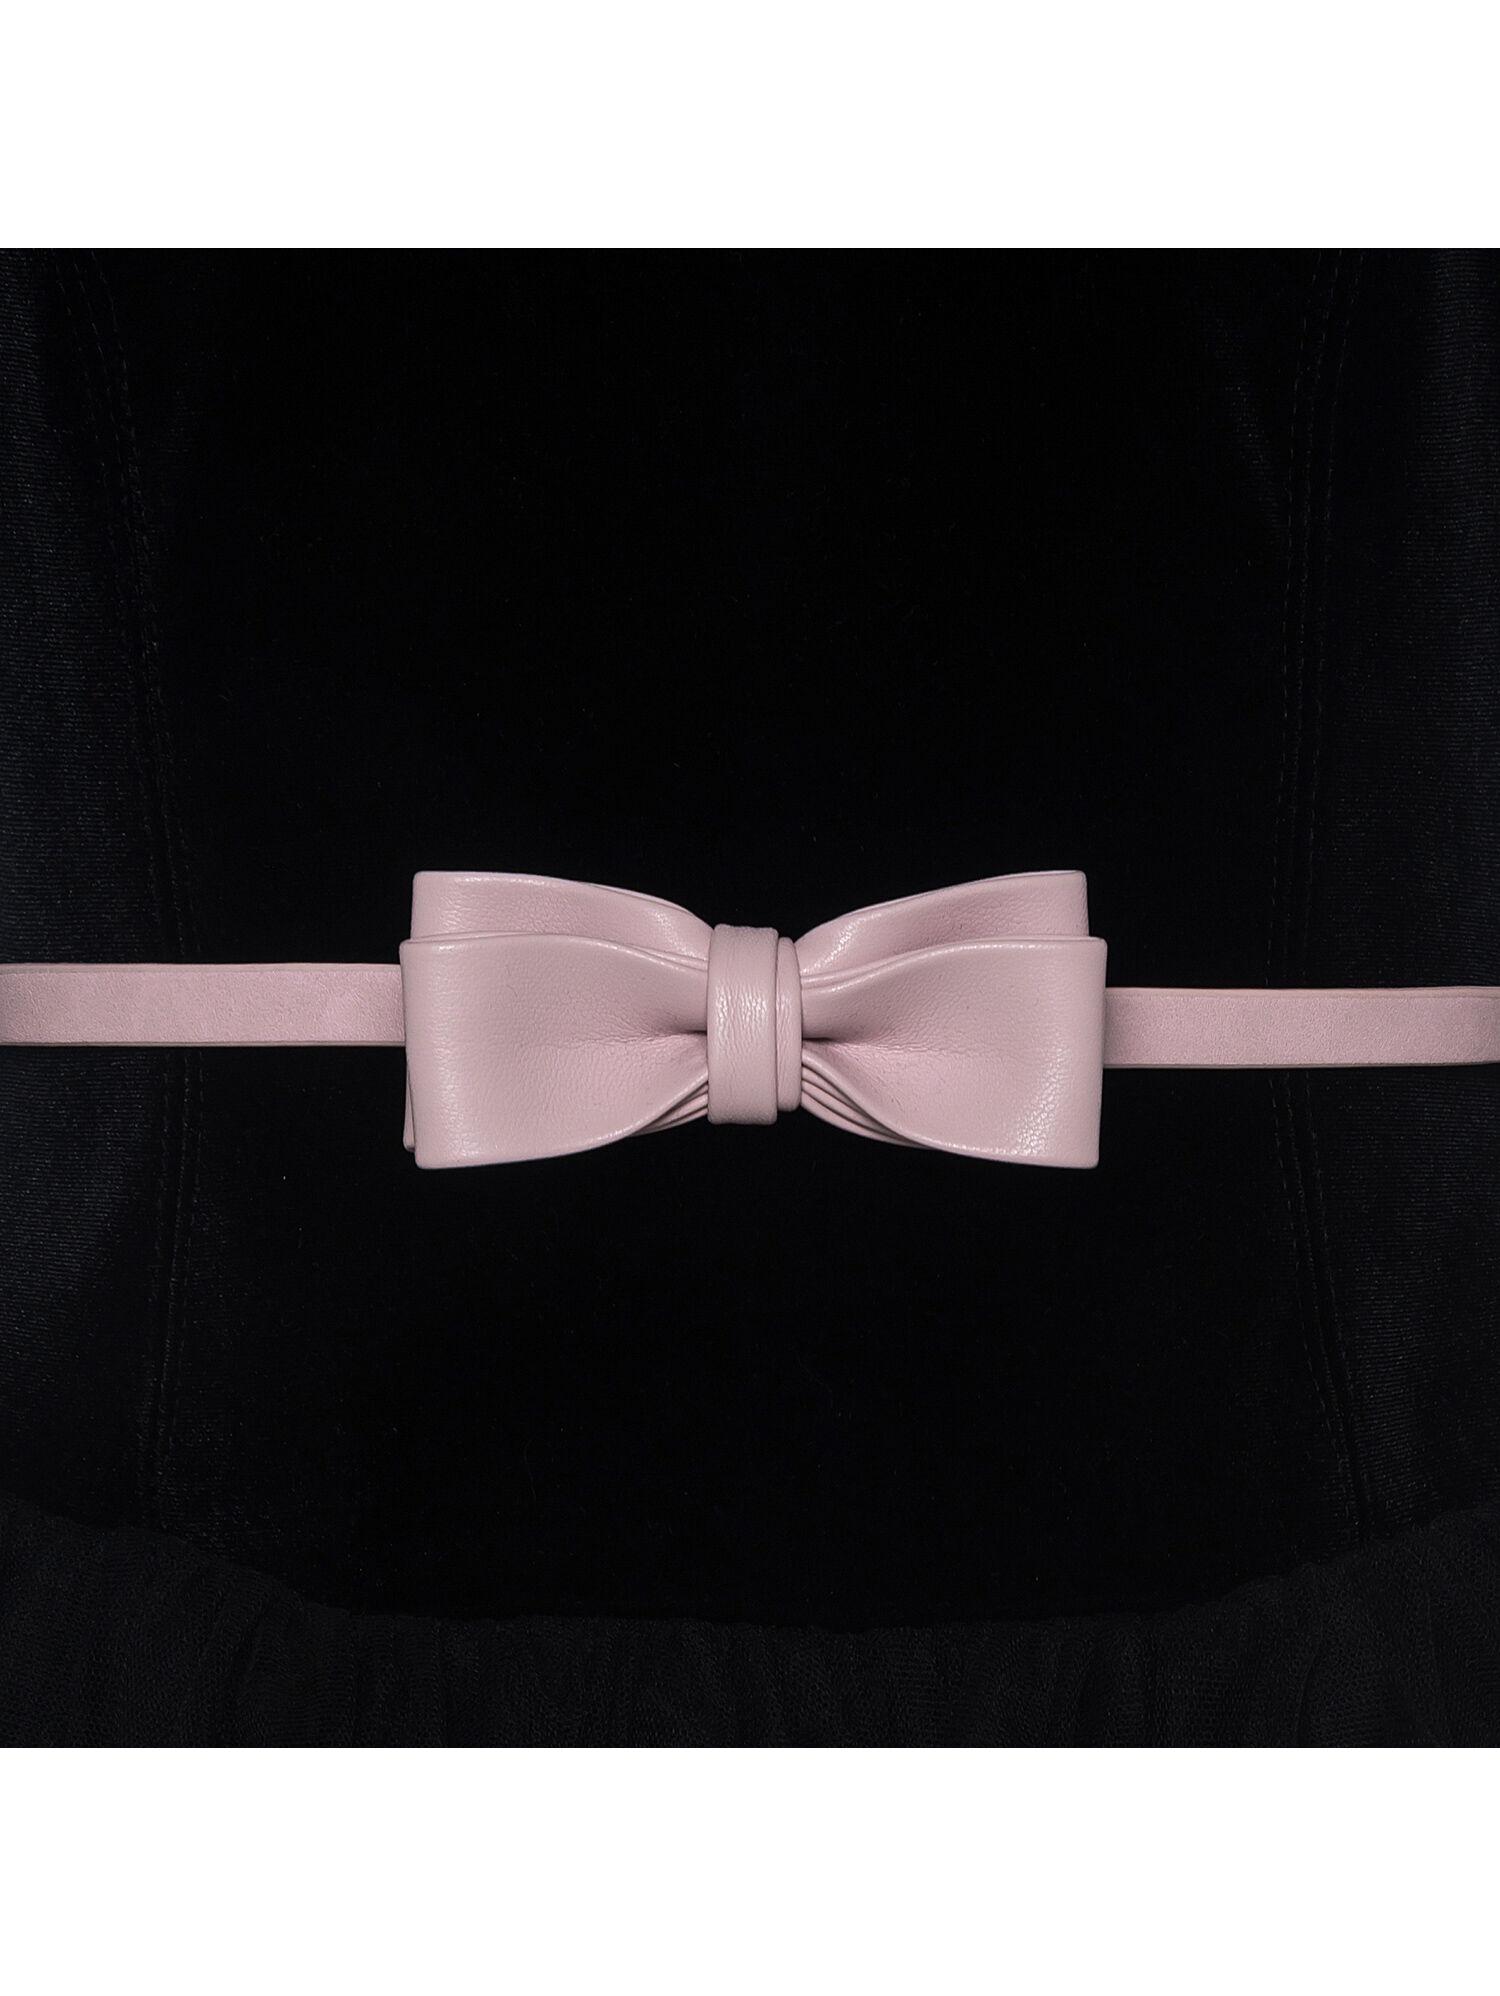 Spanish//Portuguese White /& Grey Knitted Double Ribbon Bow Set upto 18mths